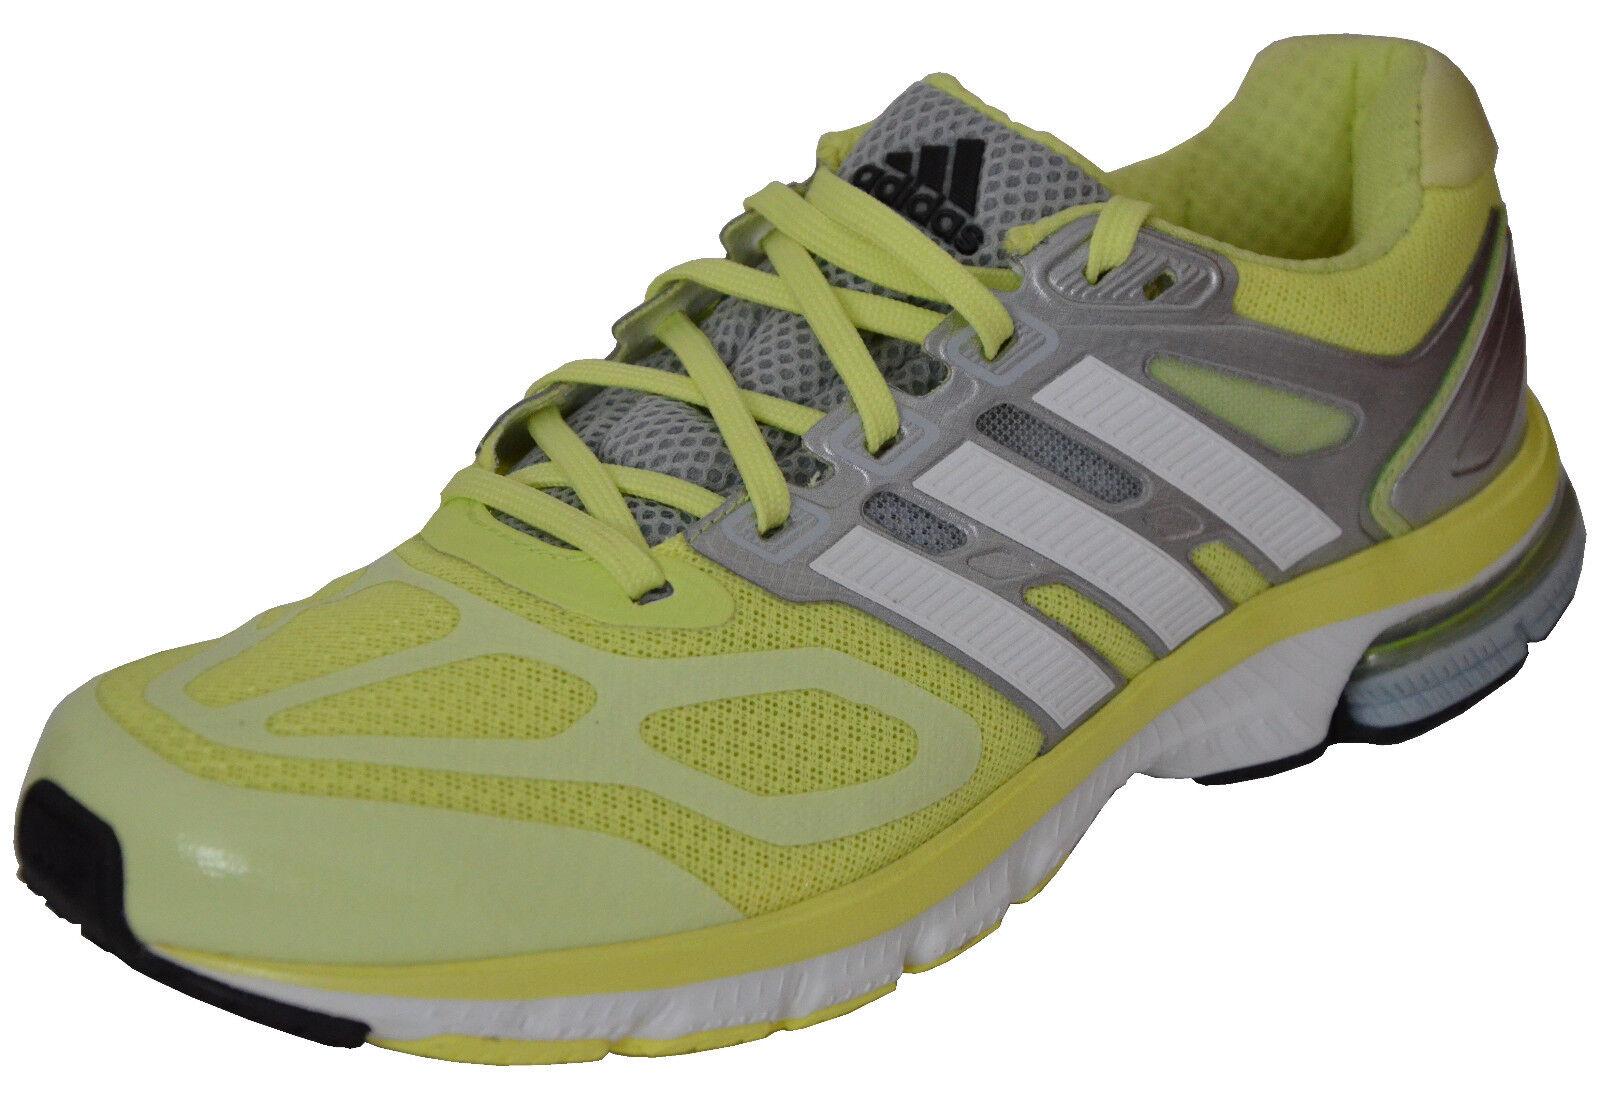 Zapatos promocionales para hombres y mujeres Adidas supernova Sequence 6W Schuhe Laufschuhe Damenschuhe Running Shohe Sneaker